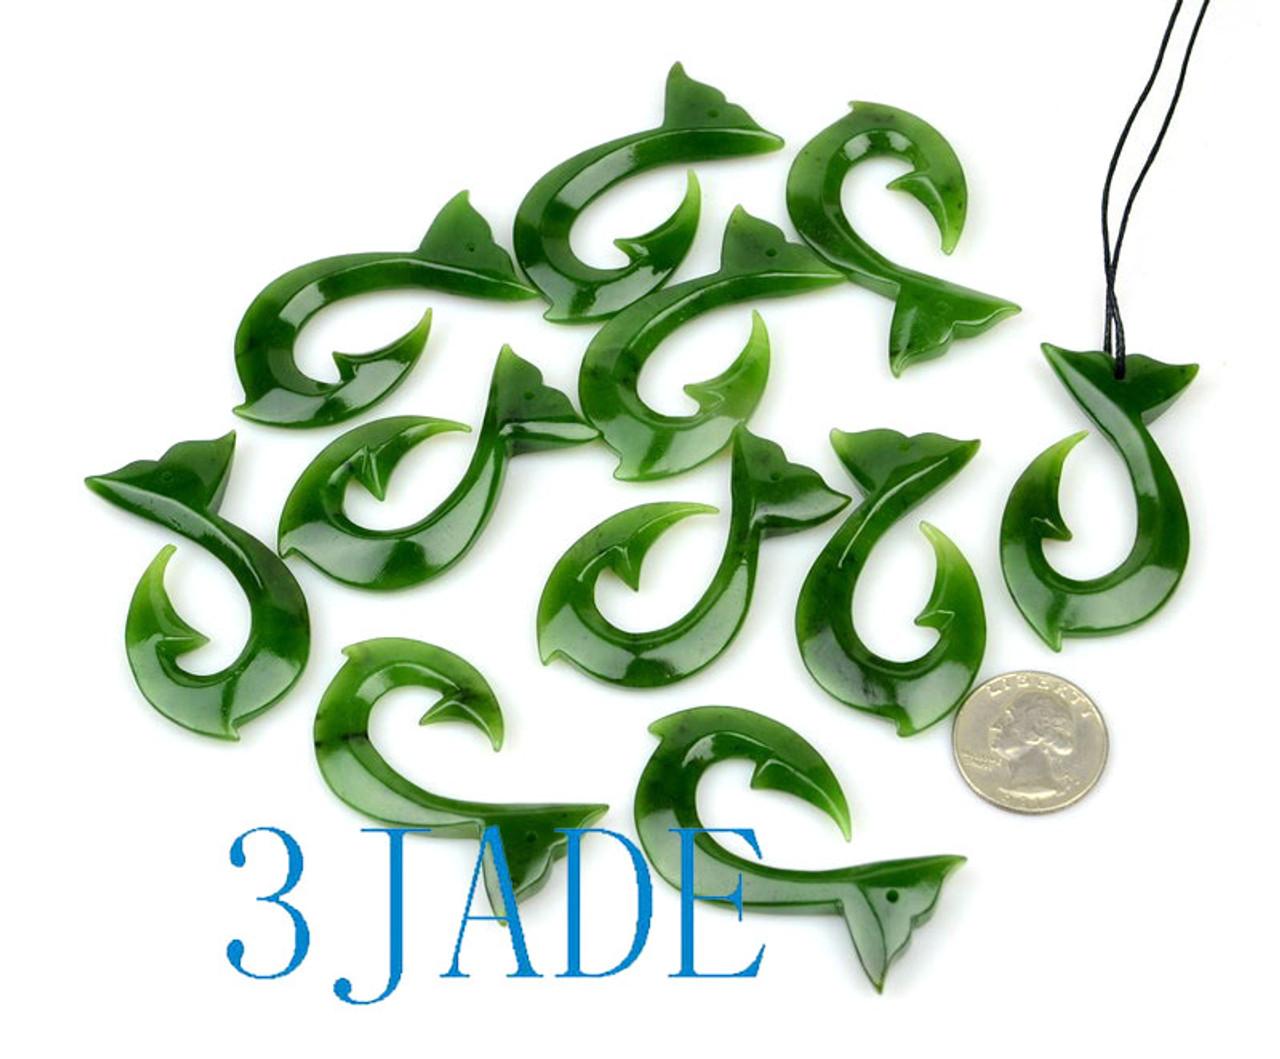 Green Jade Whale Tail Fish Hook Pendant NZ Maori Hei Matau Necklace